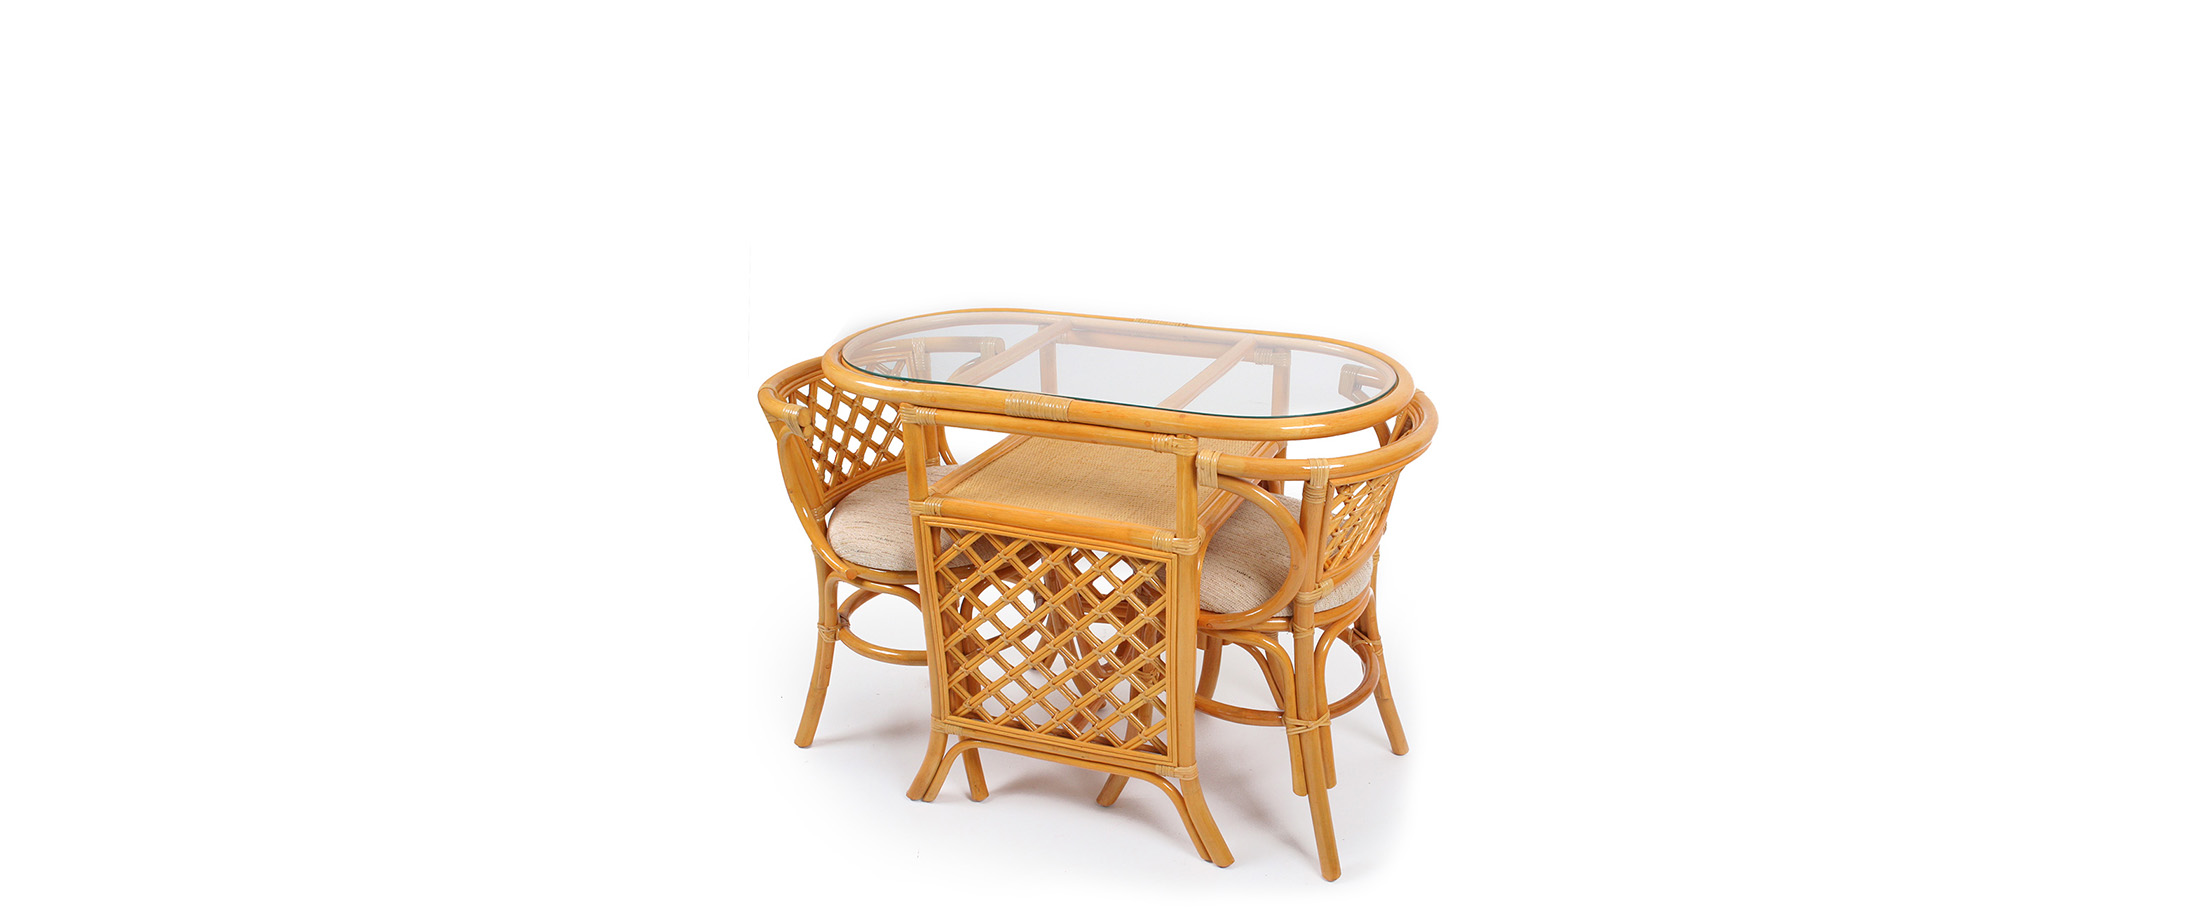 Комплект мебели Breakfast Модель 296Комплект мебели Breakfast Модель 296 артикул С000056<br>